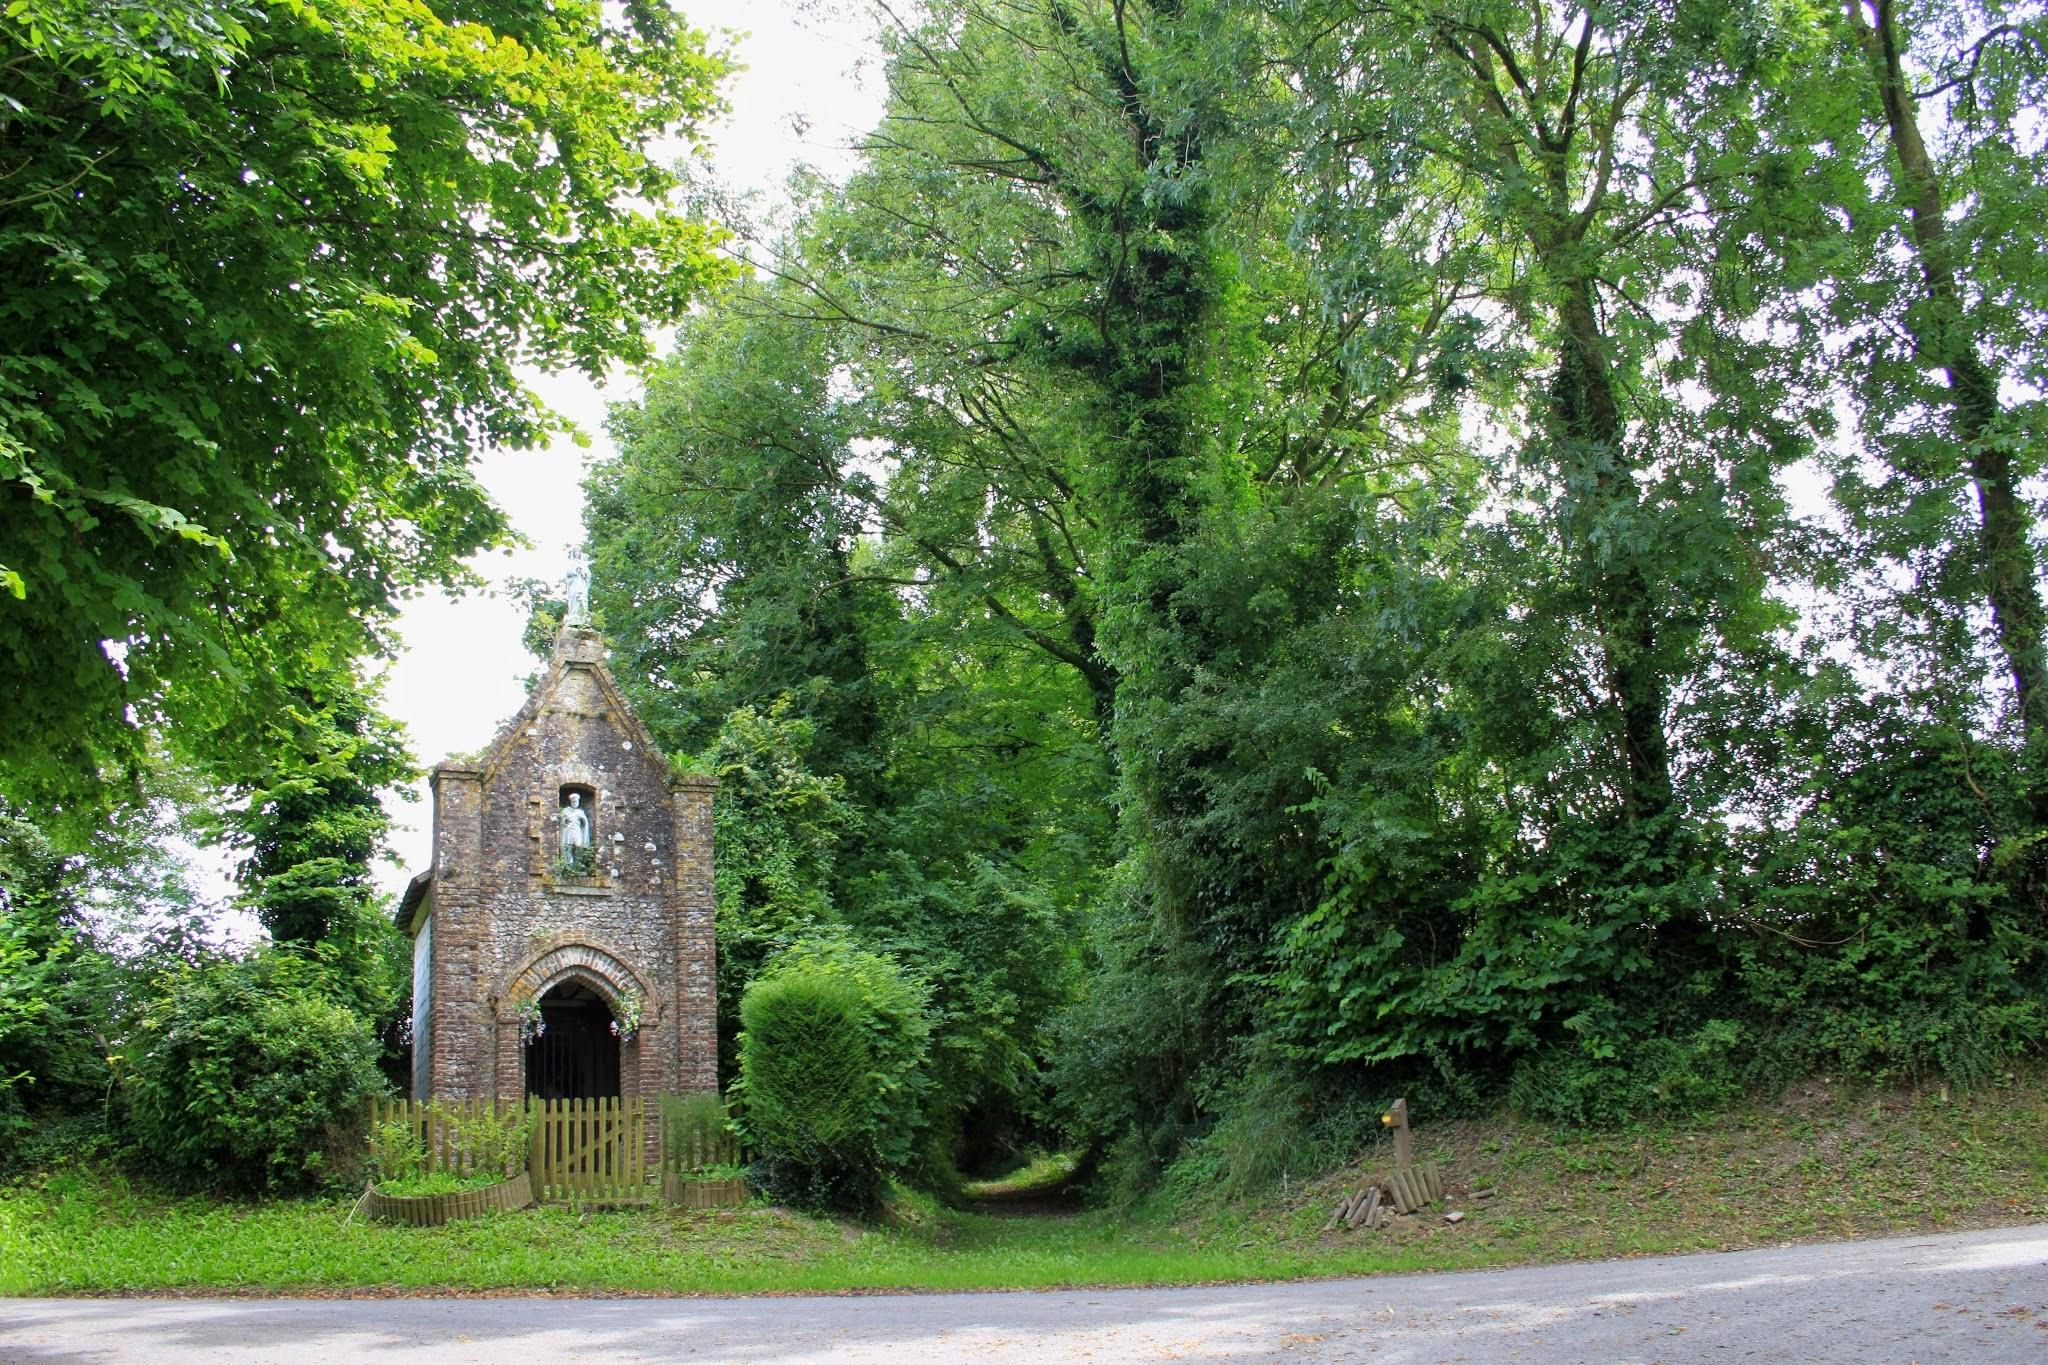 Photo: Prachtige kapel naast holle wegel